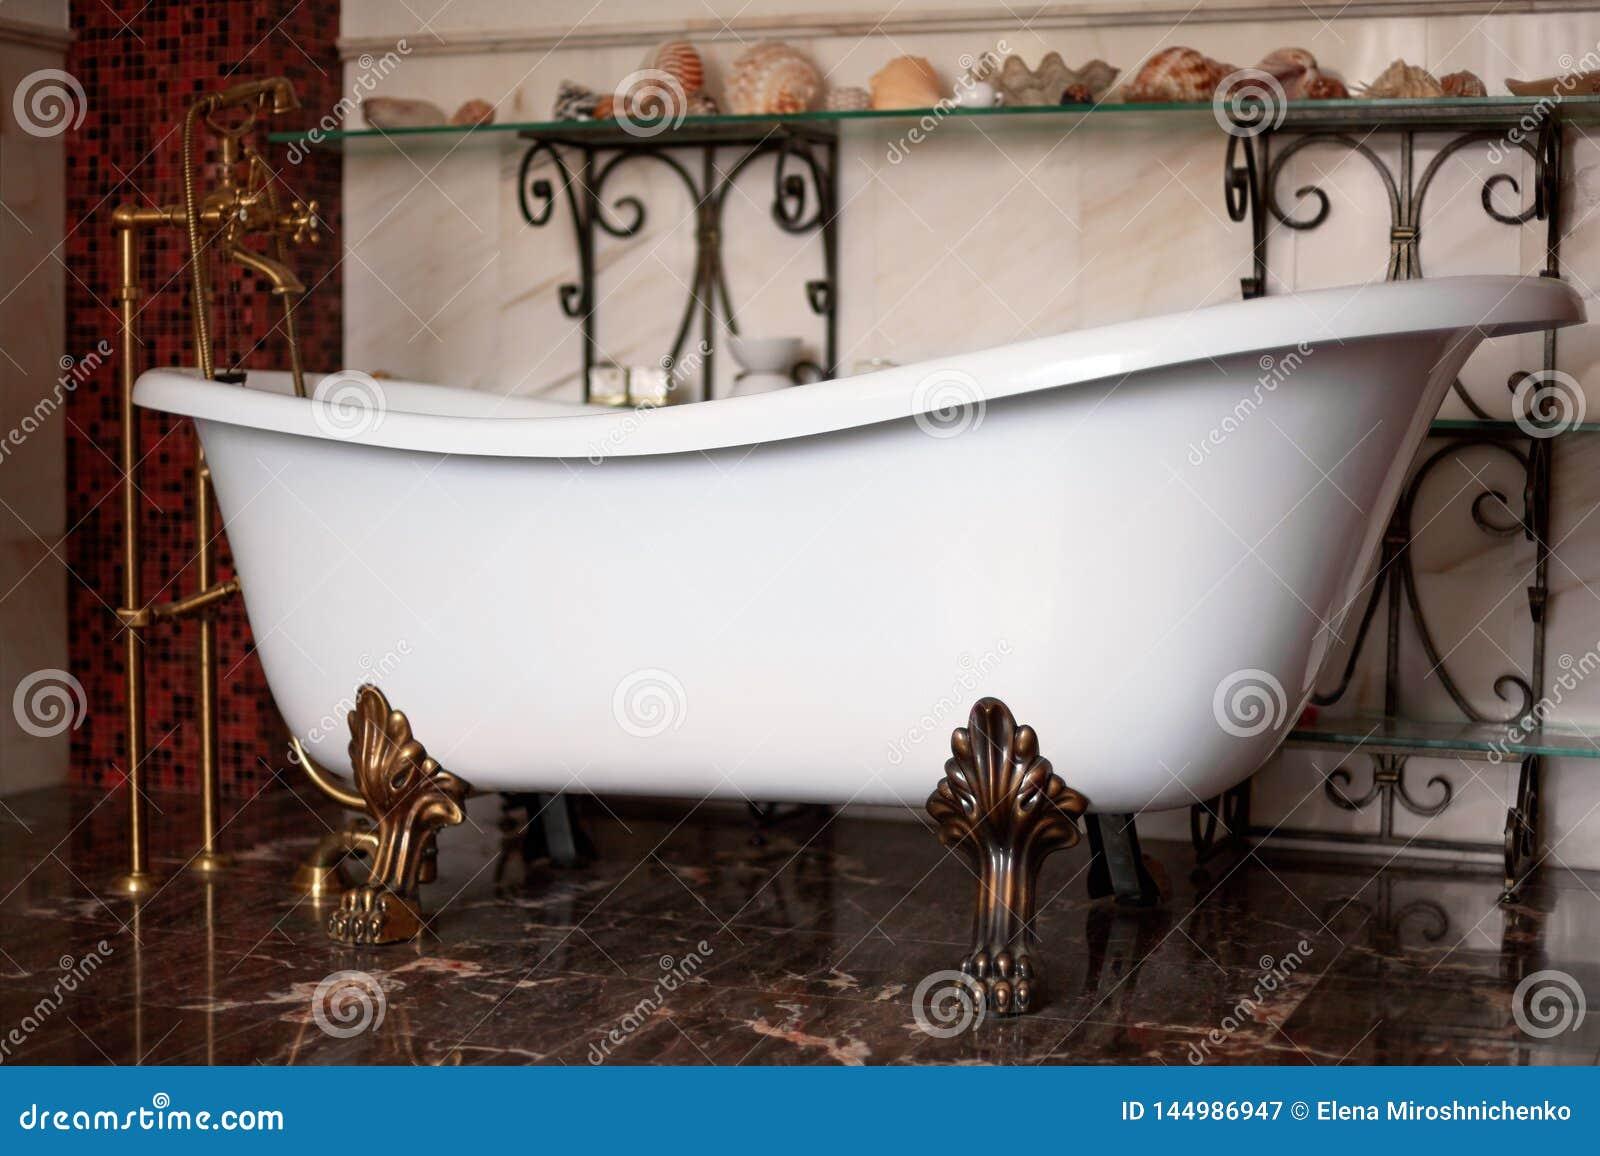 Free-standing bathtube van het luxe uitstekende brons clawfoot in uitstekend binnenland Donkere warme kleurenachtergrond met shel